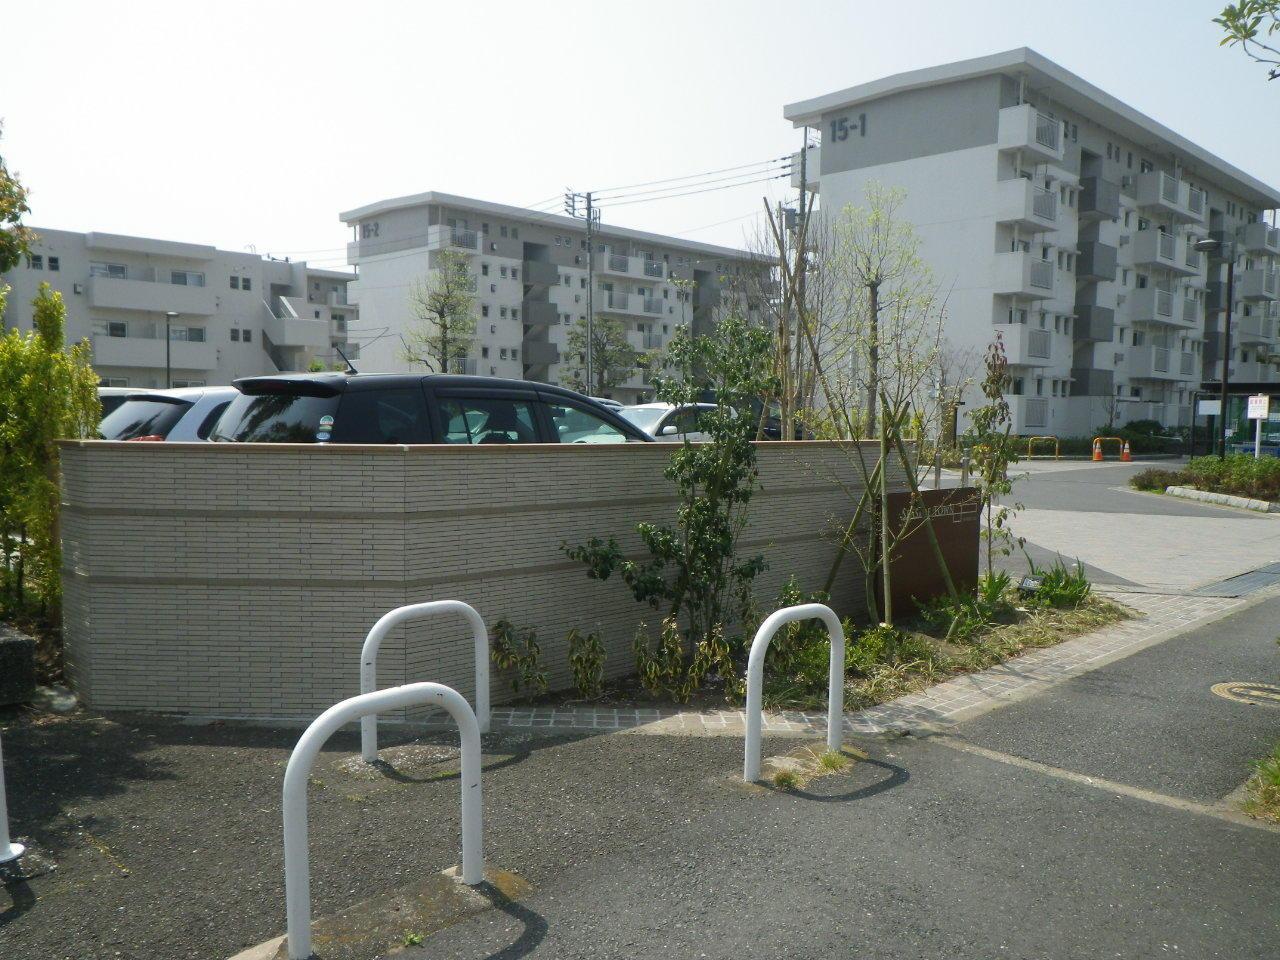 http://www.shonan-ls.co.jp/blog/landscape/img/180402%2854%29.JPG